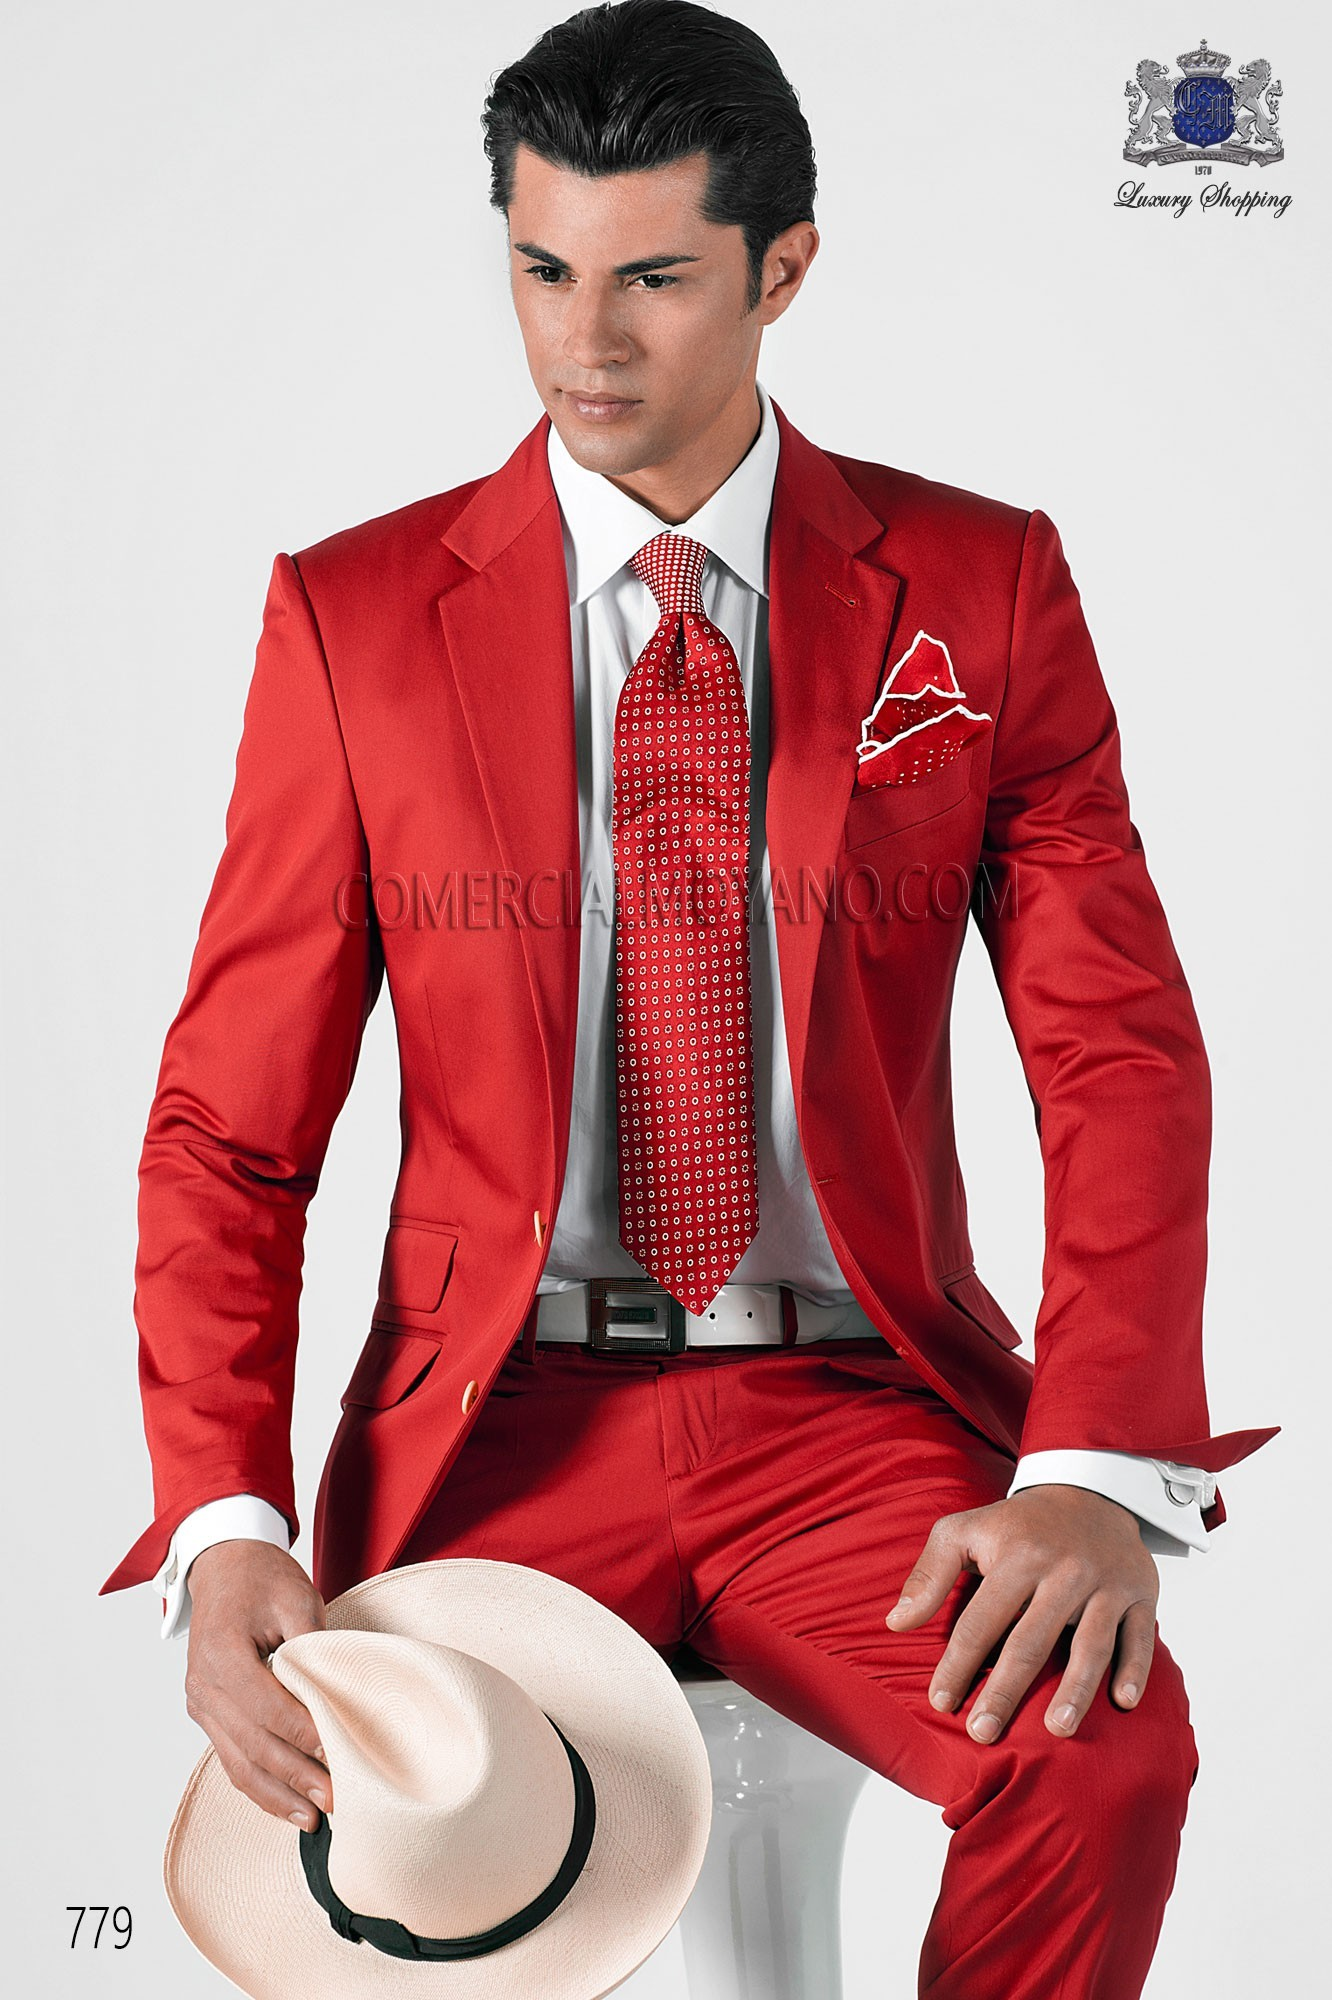 Traje de novio Hipster rojo modelo: 779 Ottavio Nuccio Gala colección Hipster